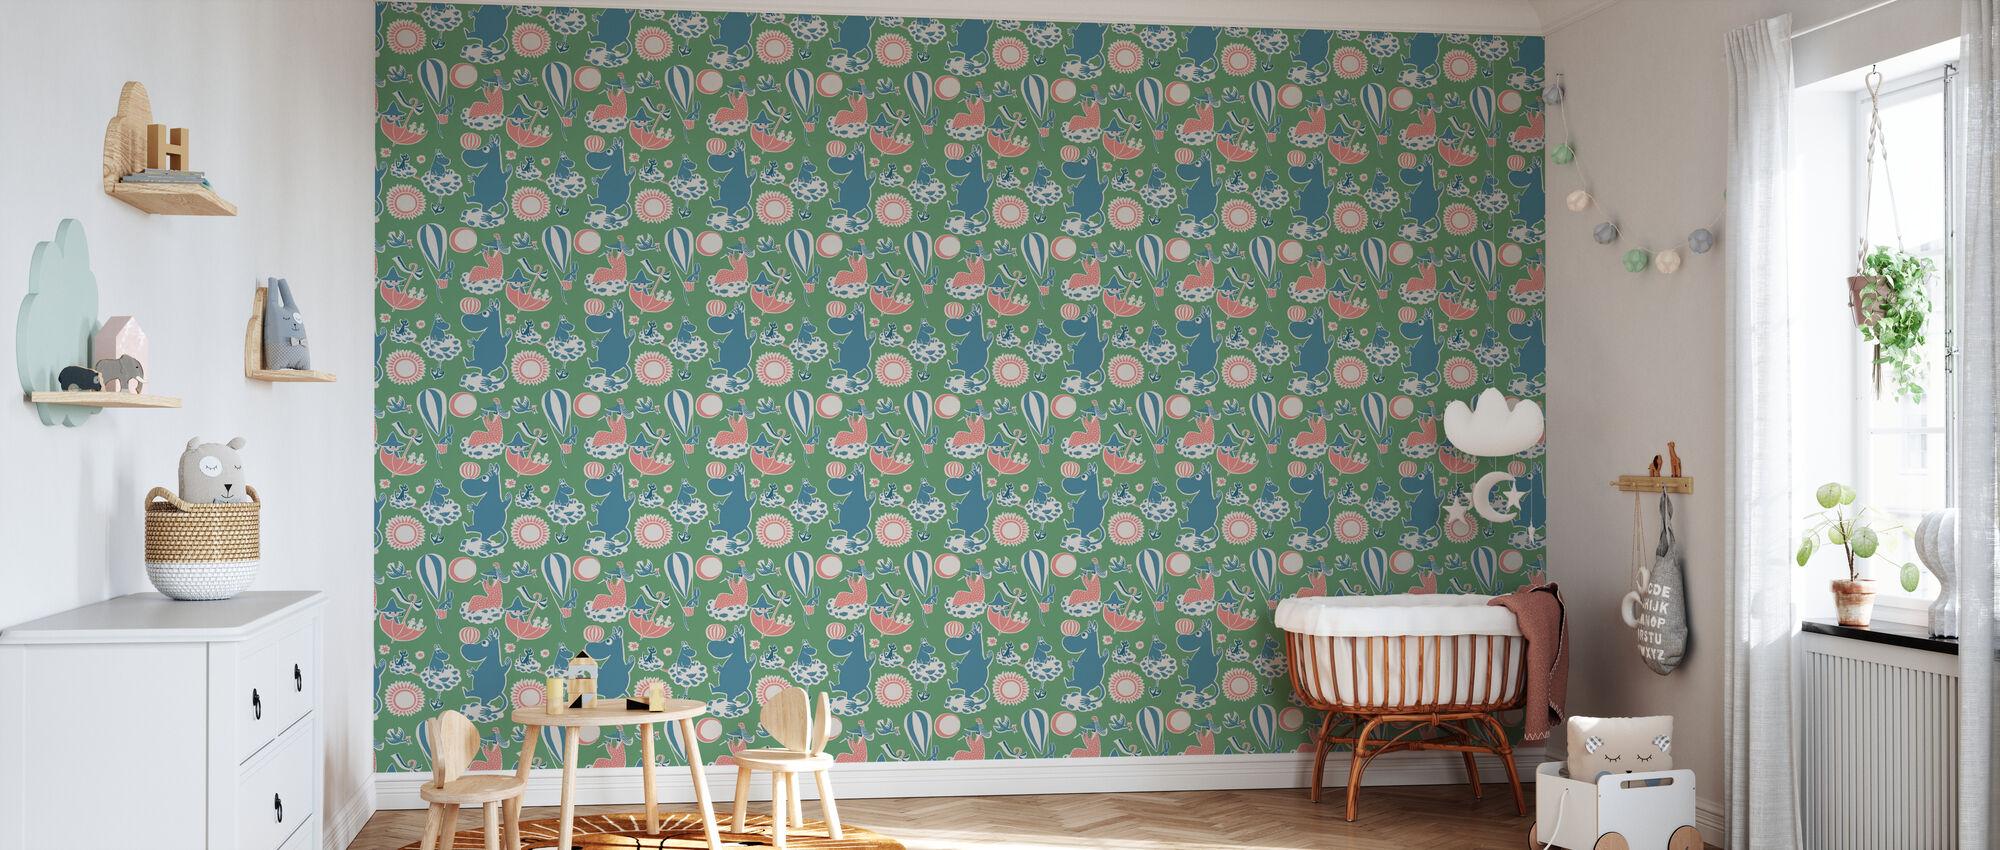 Moomin Retro Pattern - Green - Wallpaper - Nursery